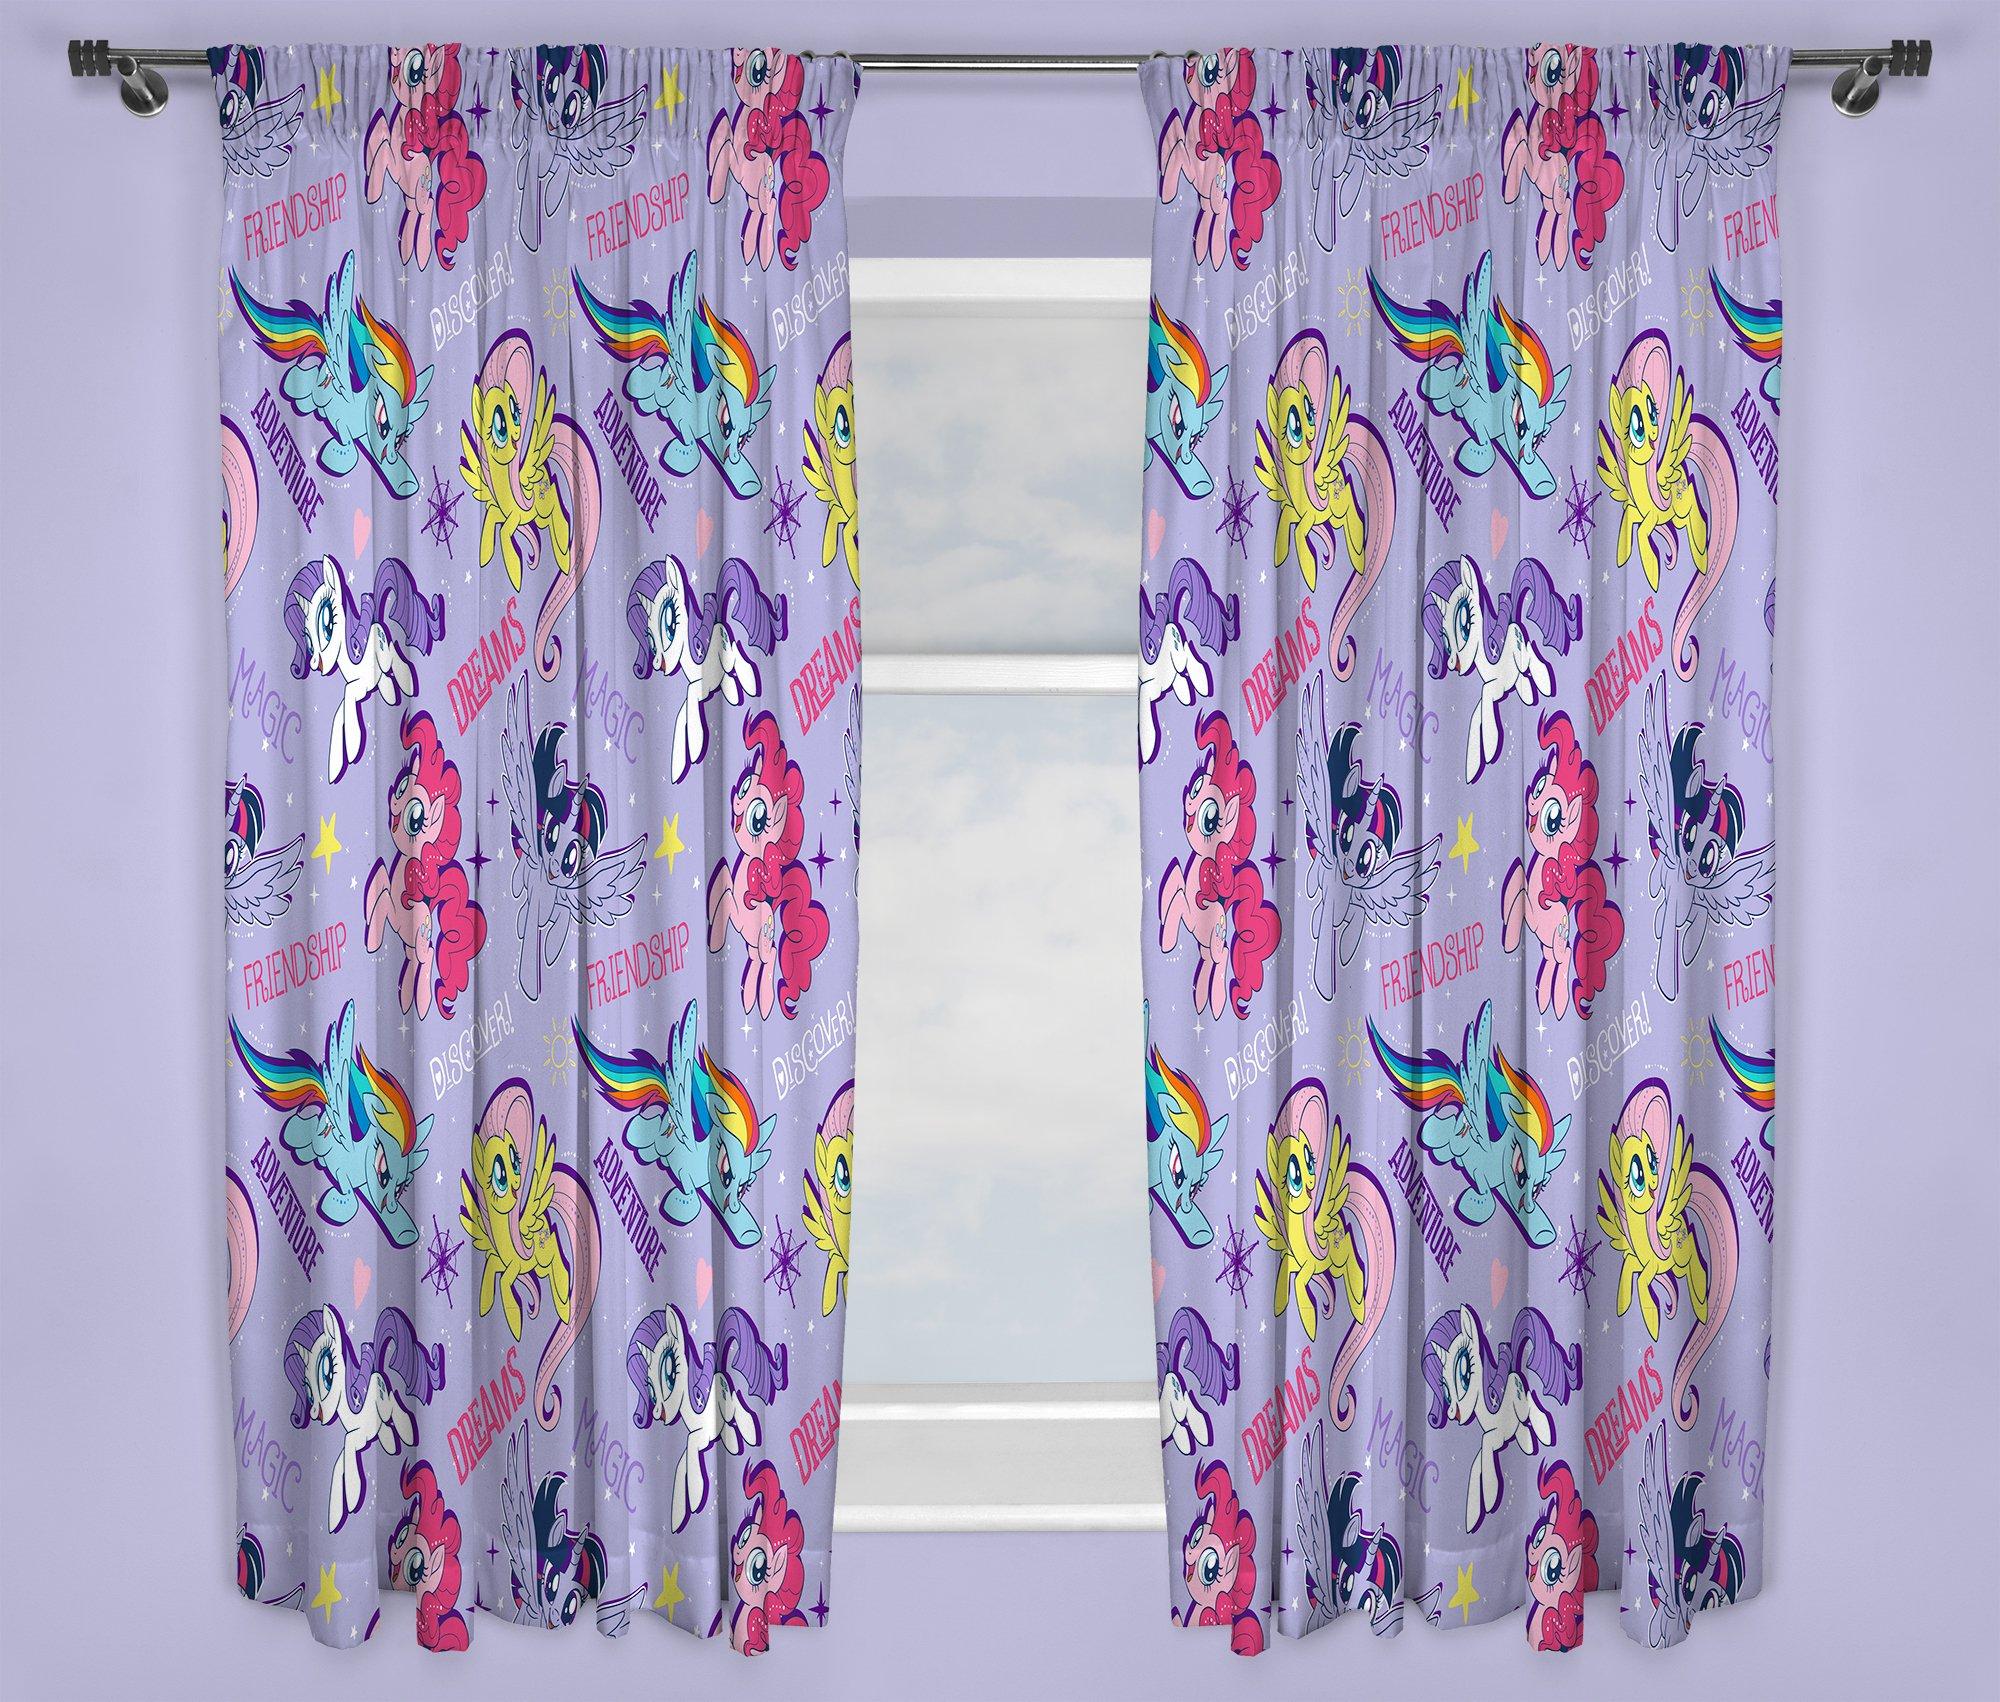 Attractive My Little Pony Adventure Curtains   168x137cm